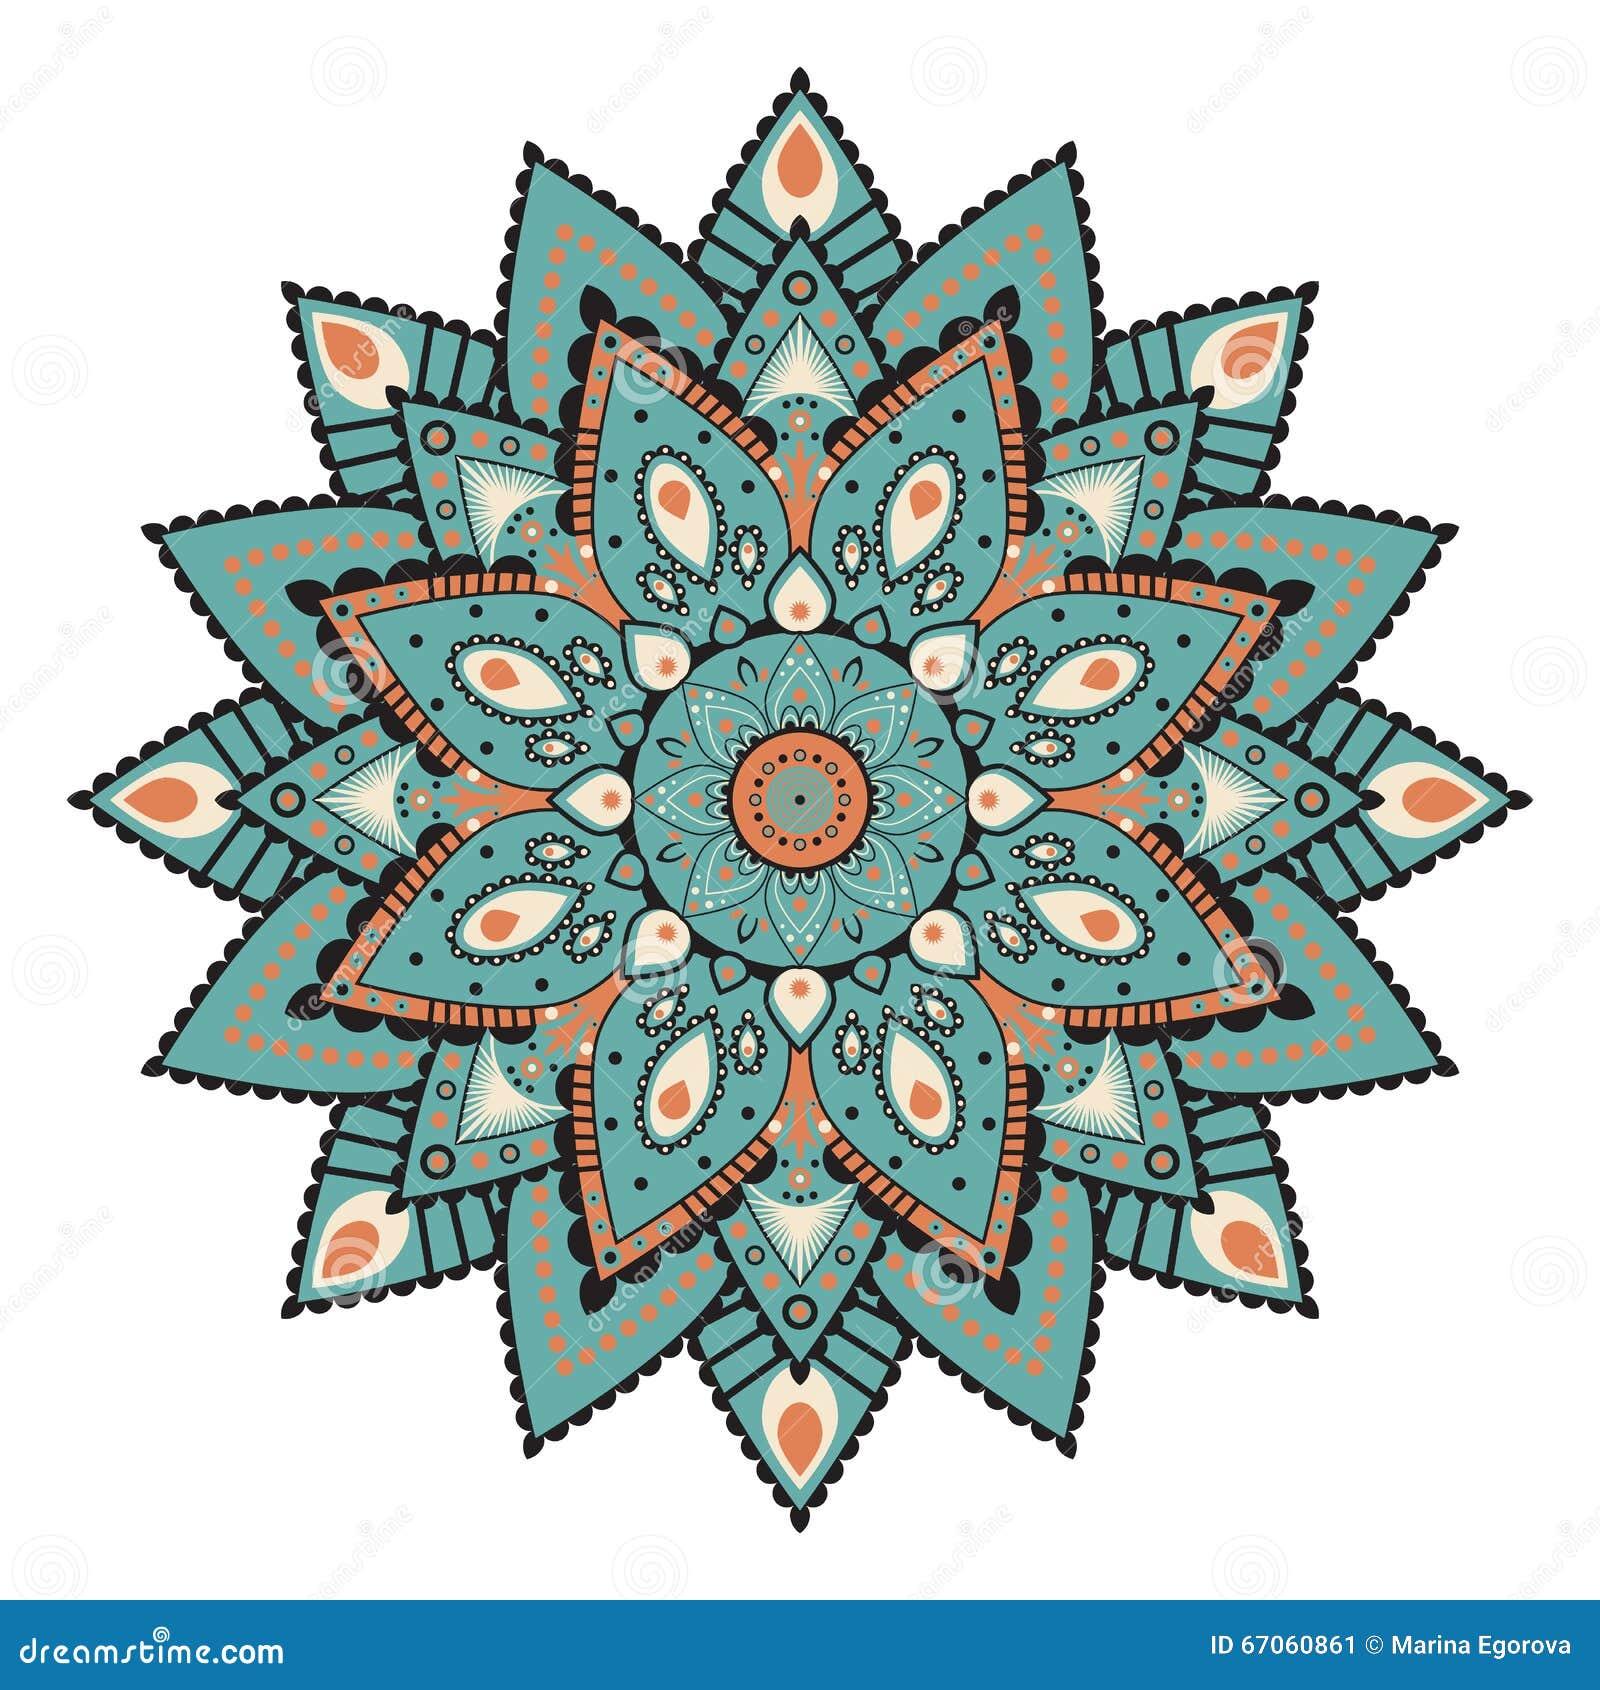 c84e48a492b Mandala Of Cirkel Symmetrisch Patroon Vector Illustratie ...